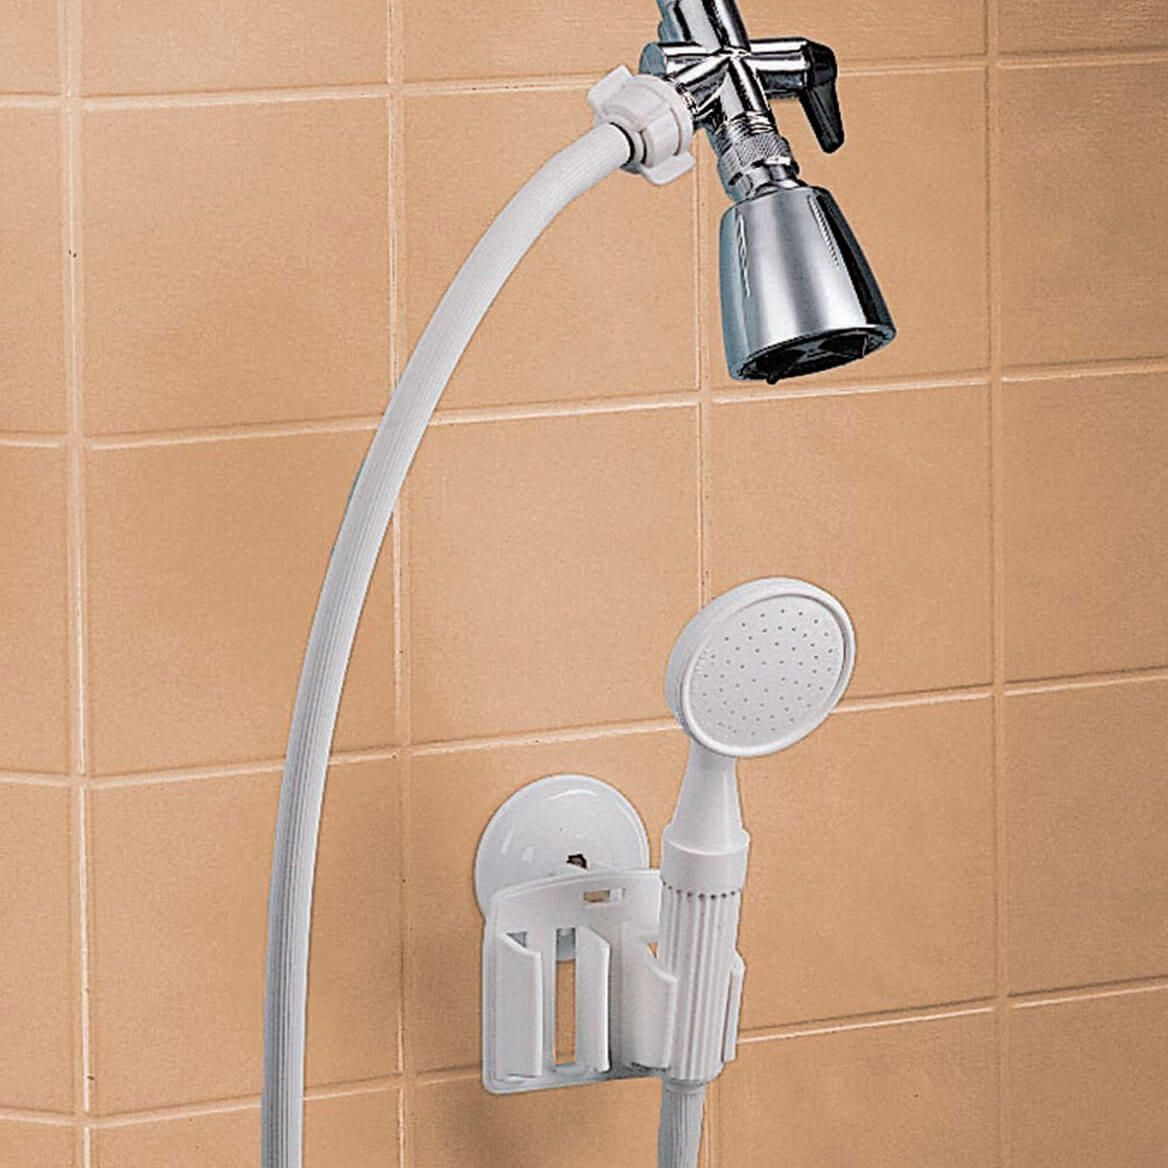 Detachable Hand-Held Shower Sprayer-304556